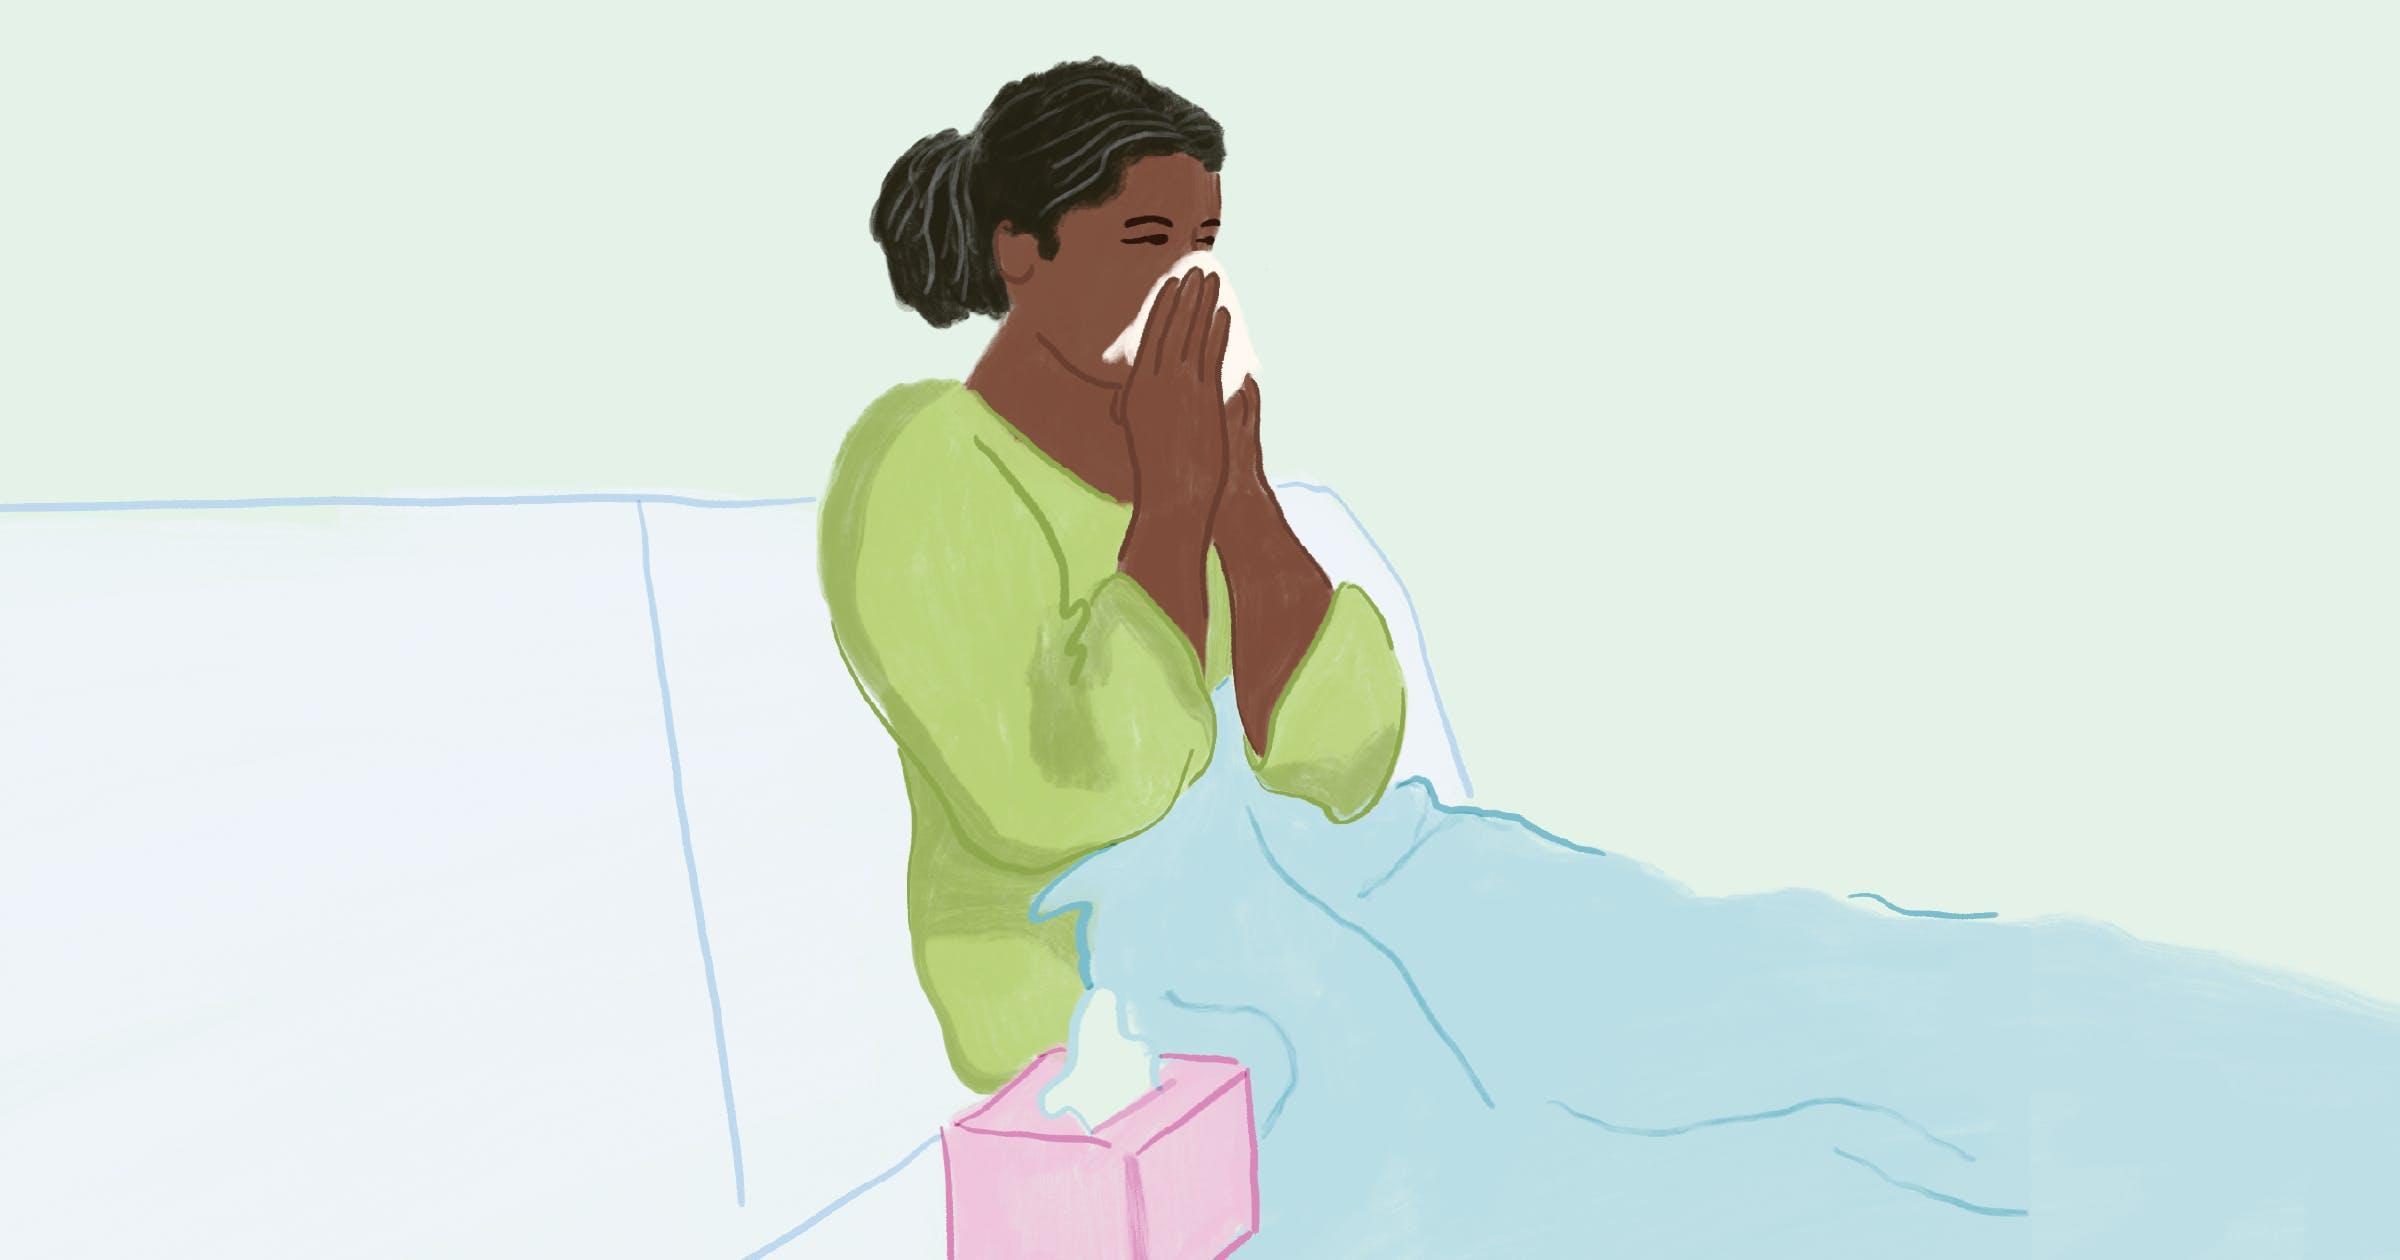 Cold, Flu, or COVID-19? Your Seasonal Symptom Guide